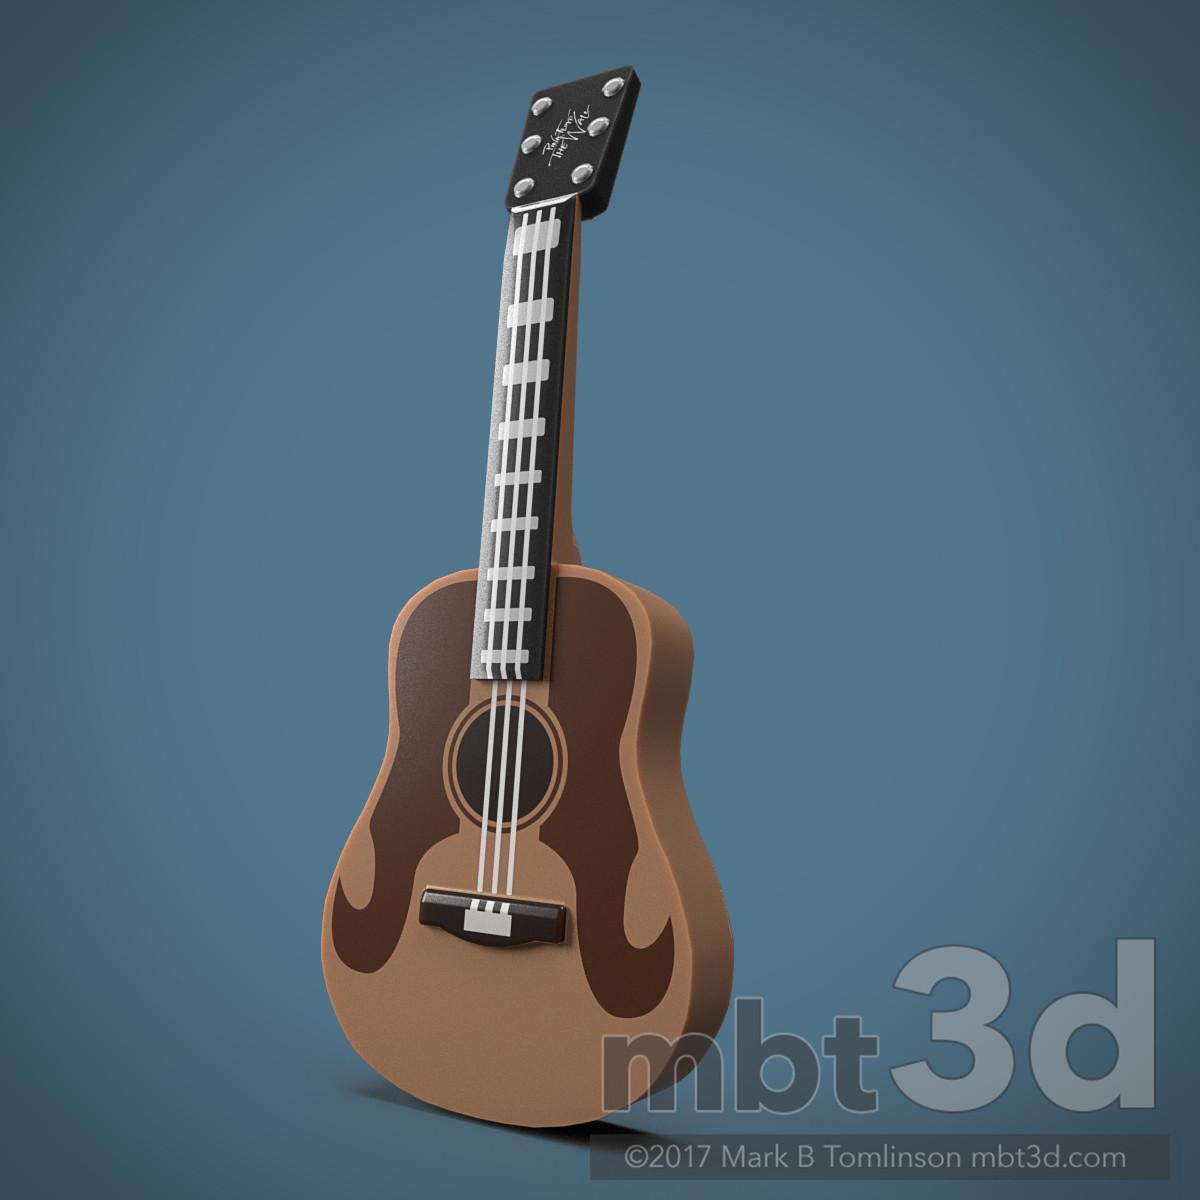 Minifigure Guitar Prop